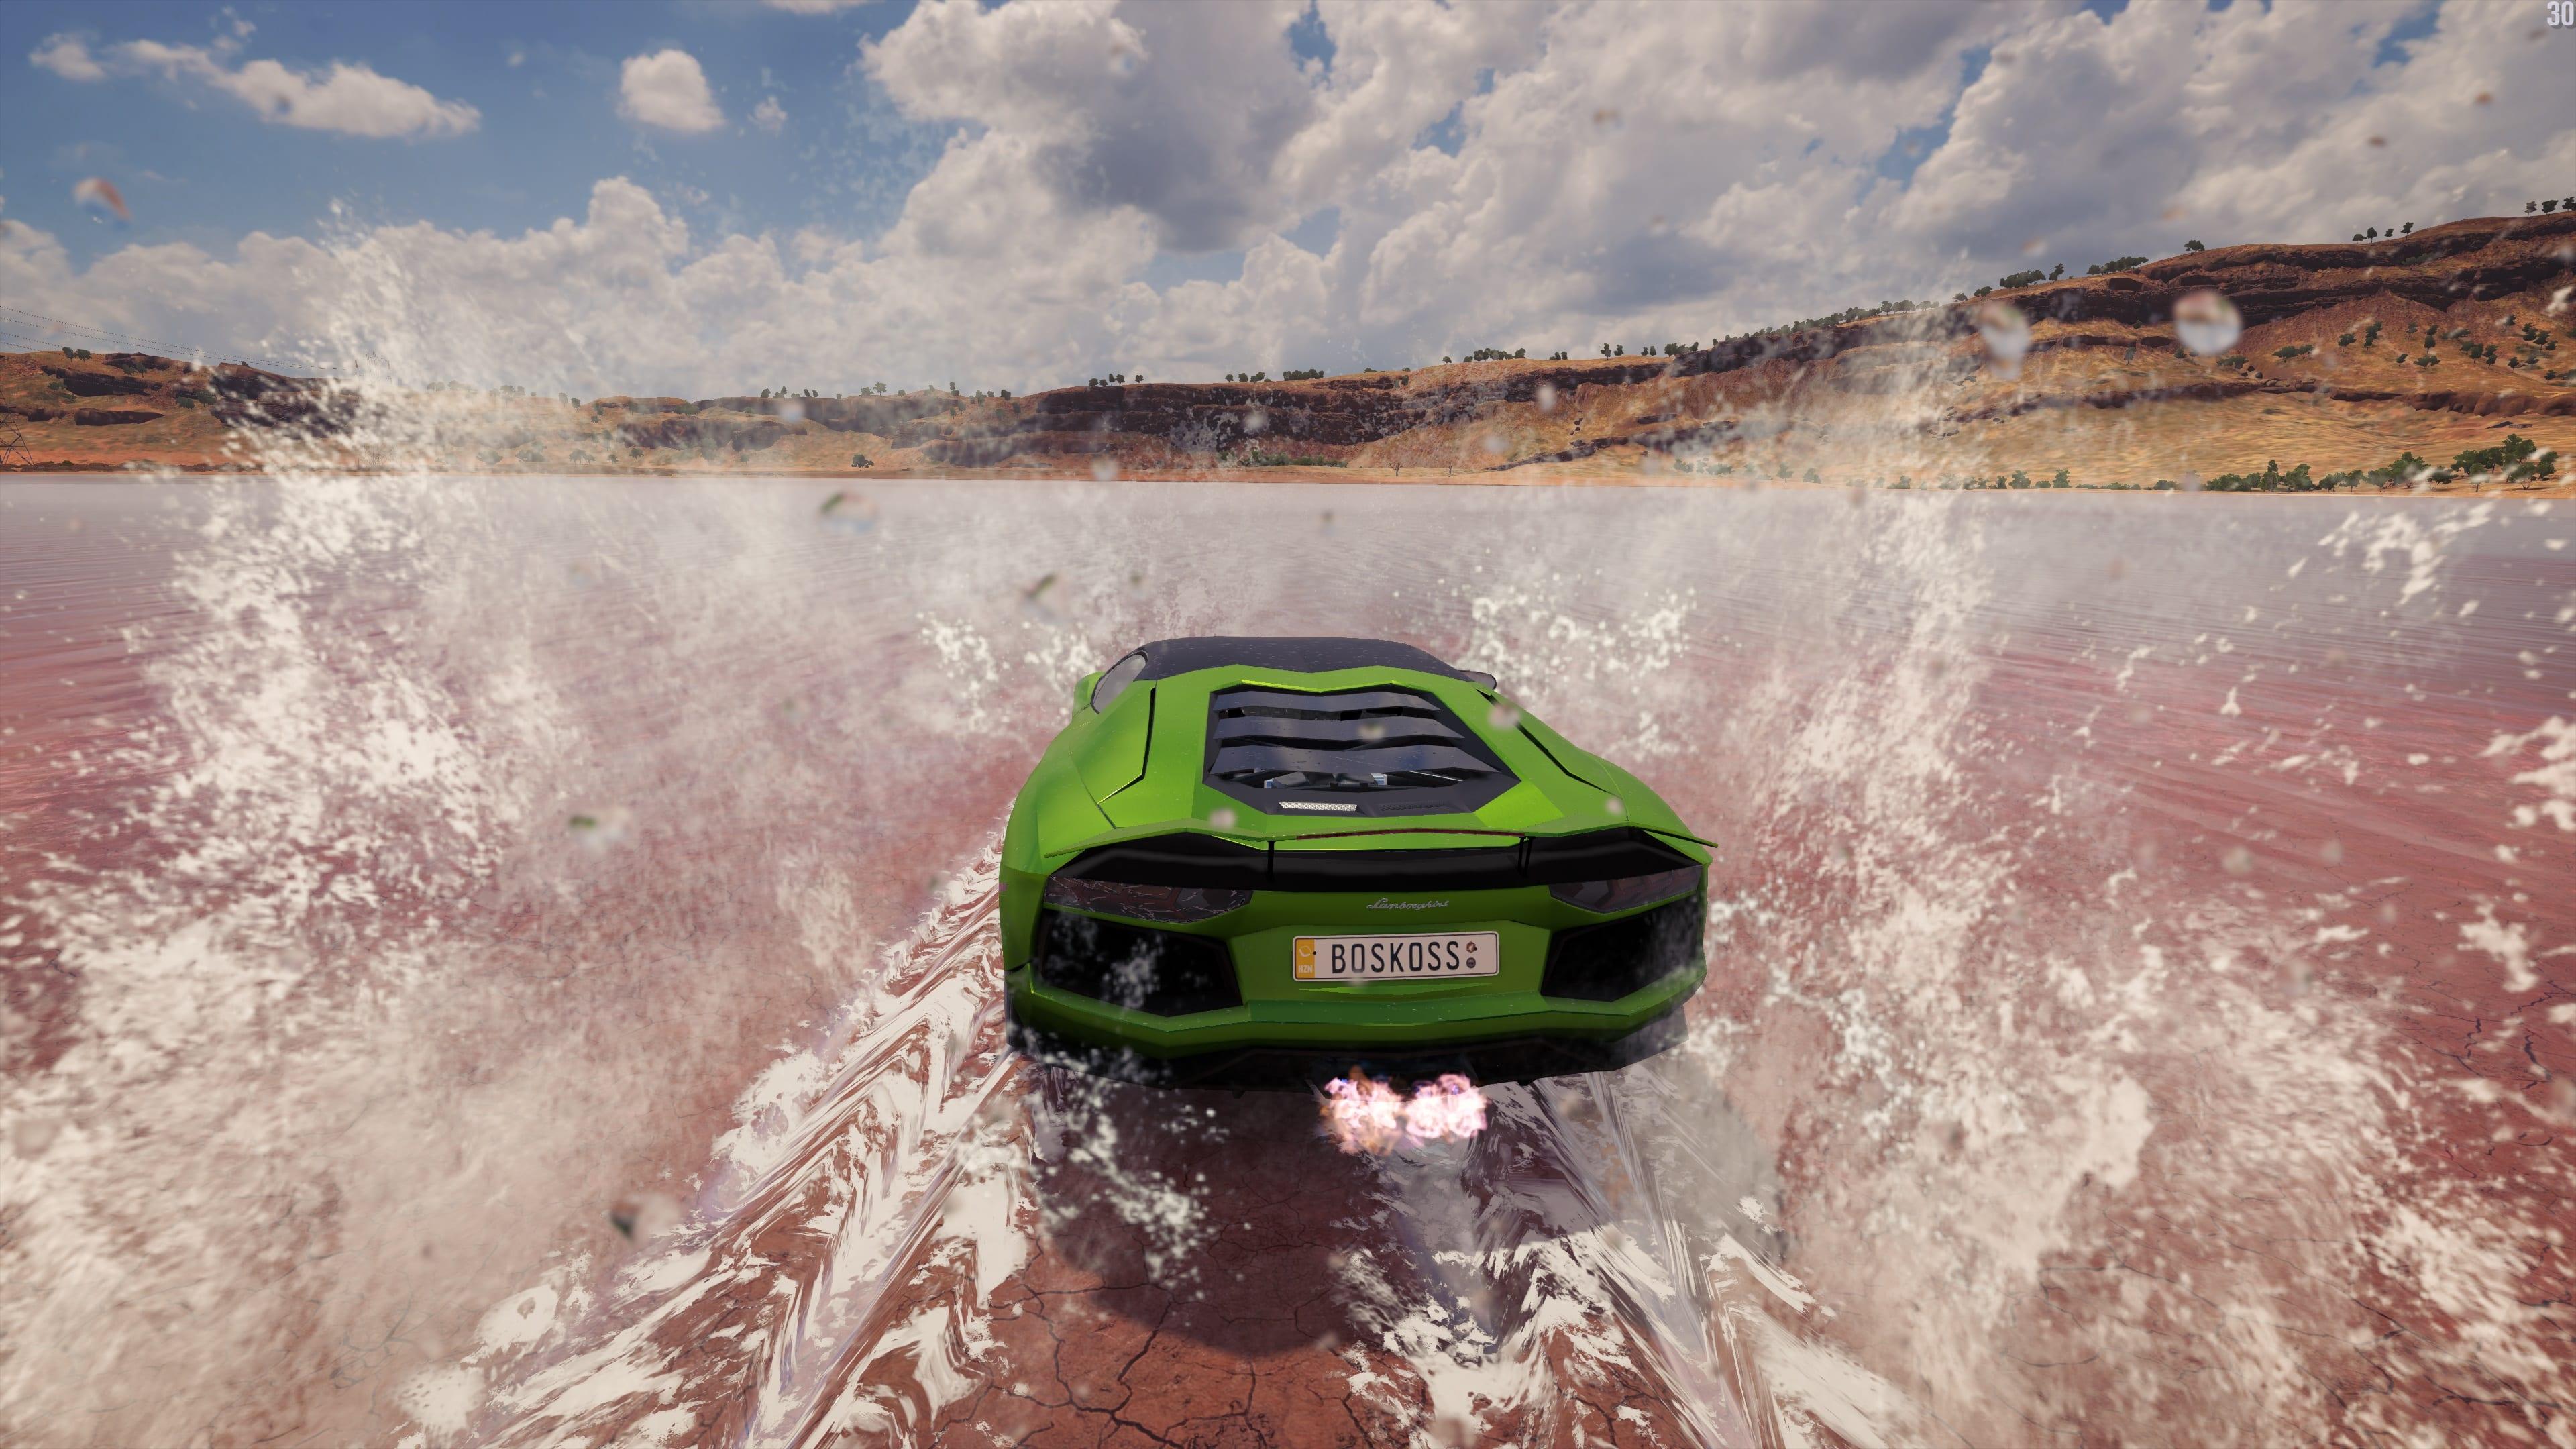 Forza Horizon 3 Galleria 4K PC Gamingit